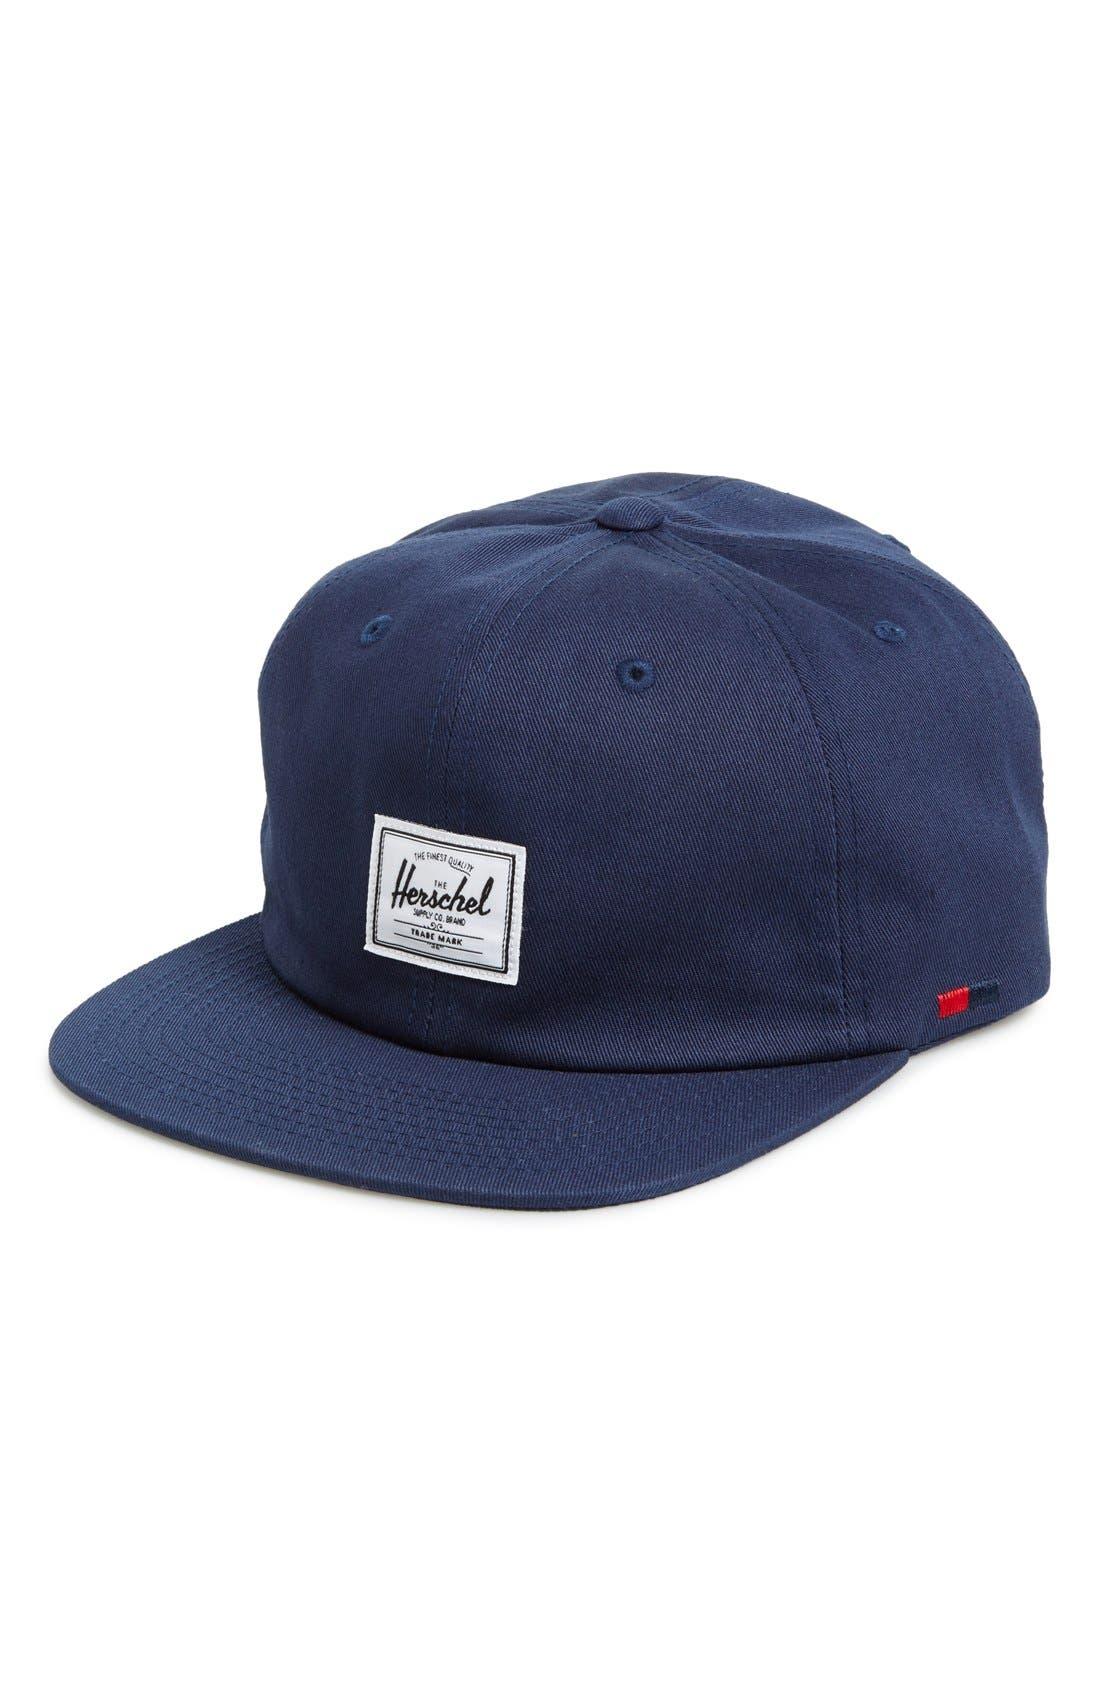 Alternate Image 1 Selected - Herschel Supply Co. 'Albert' Cotton Baseball Cap